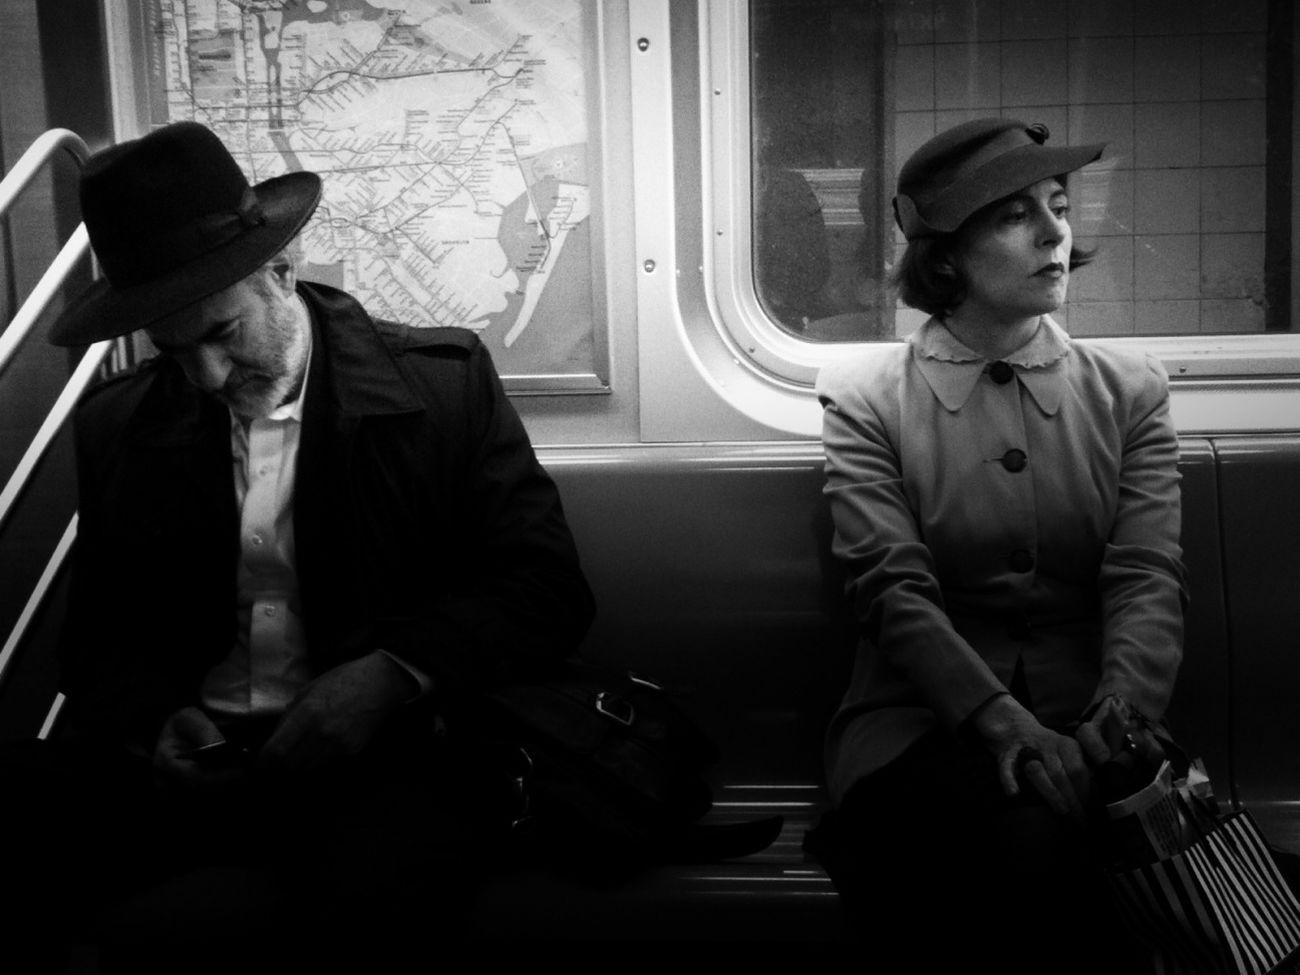 Commuting